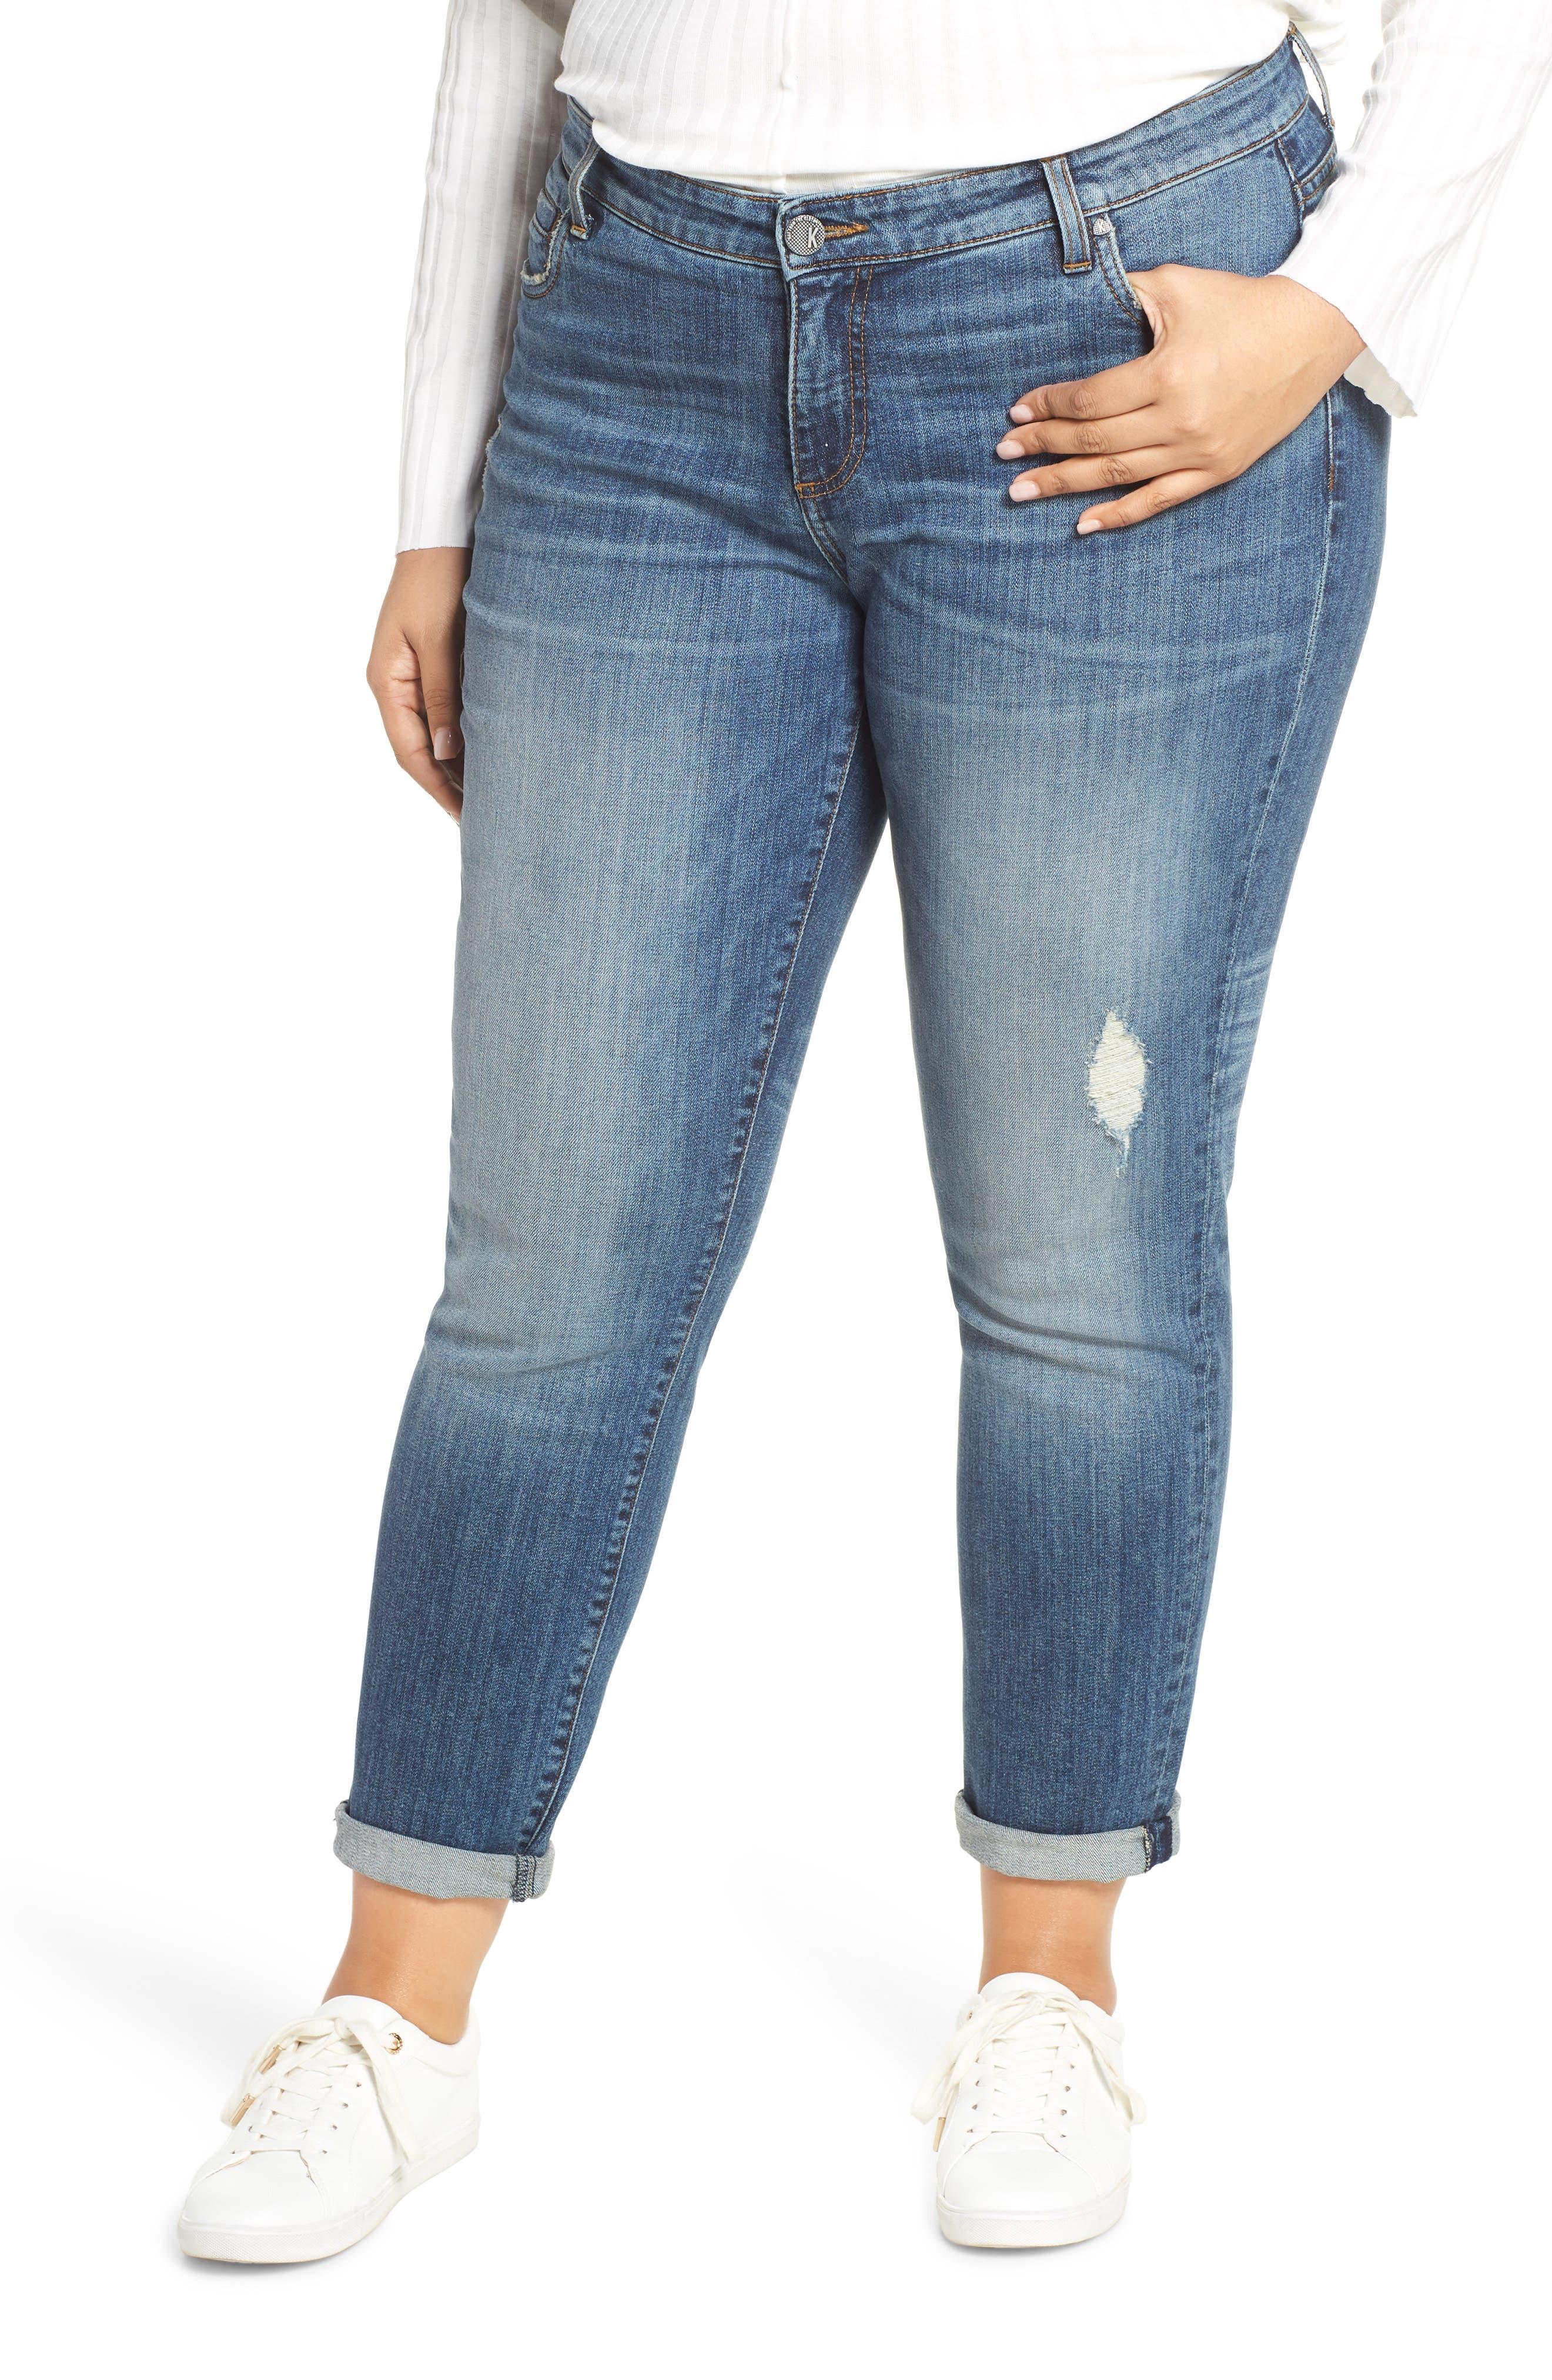 Plus Size Kut From The Kloth Catherine Slim Boyfriend Jeans, Blue